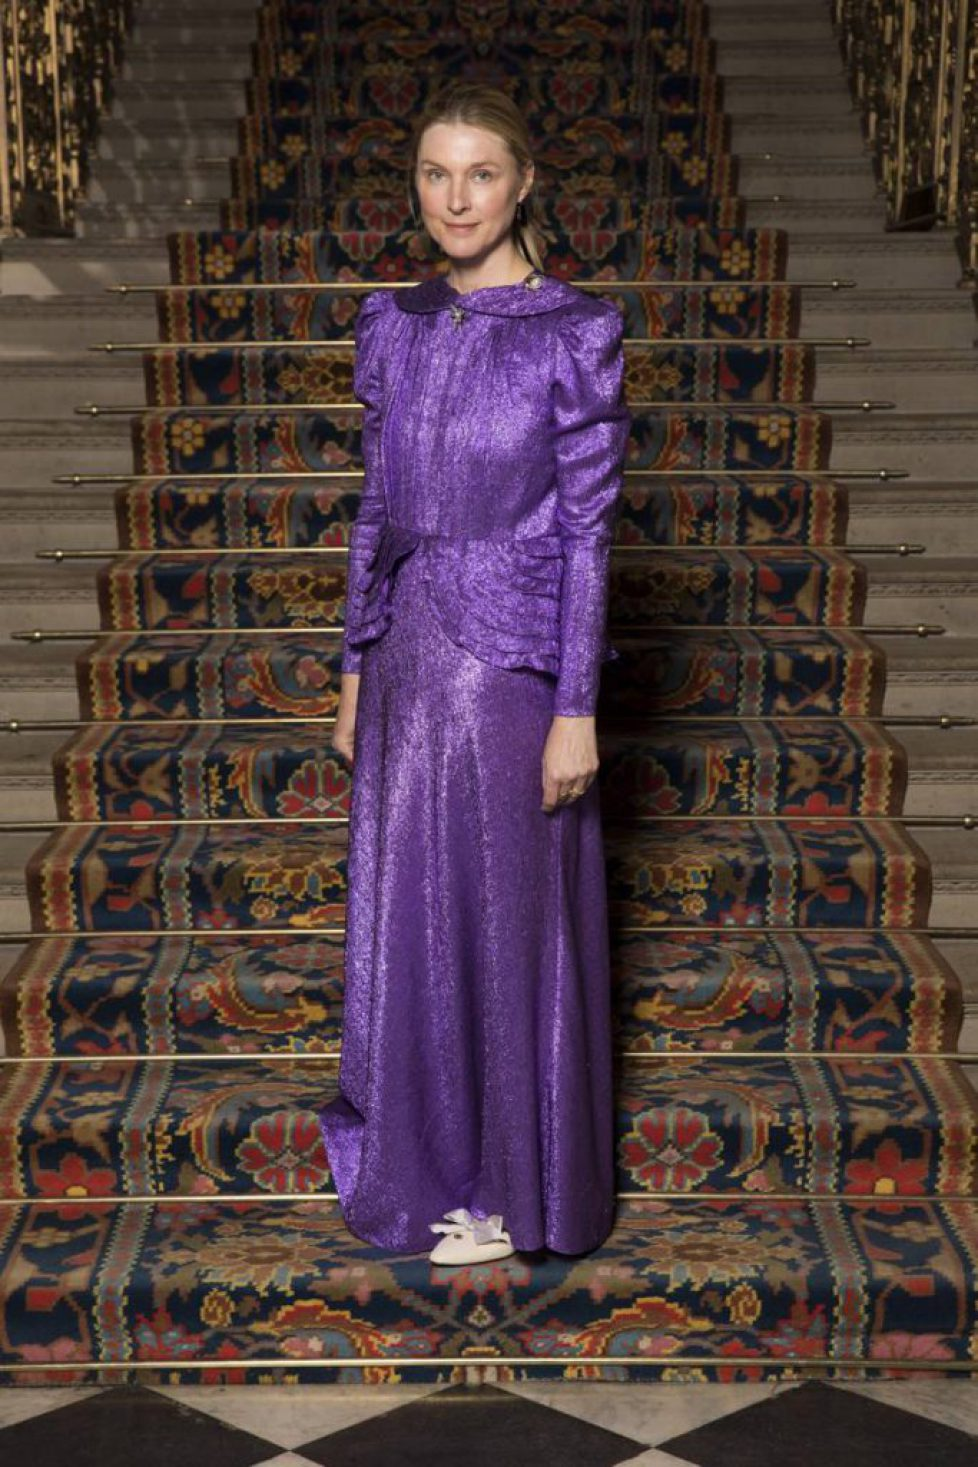 lady-laura-cavendish-countess-of-burlington